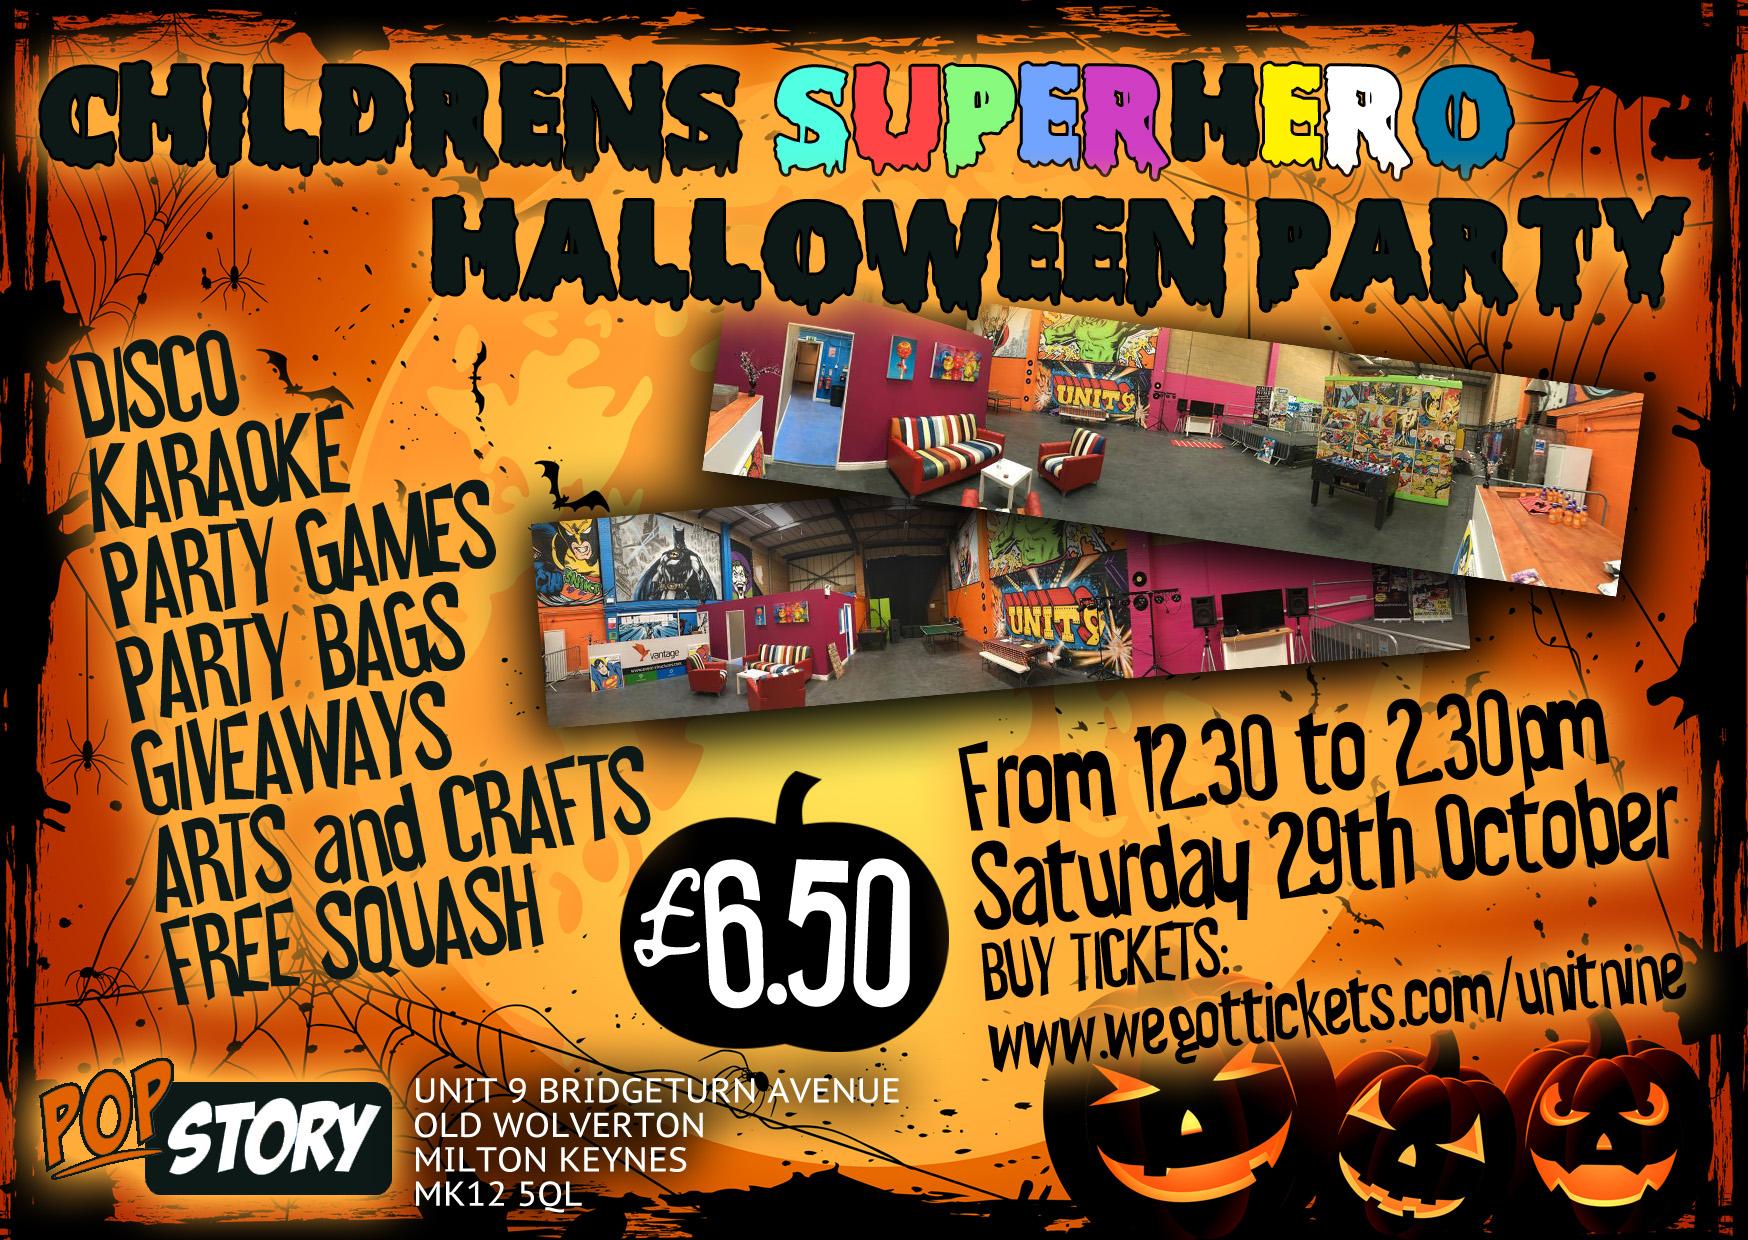 2016.10.29.Childrens Superhero Halloween Party